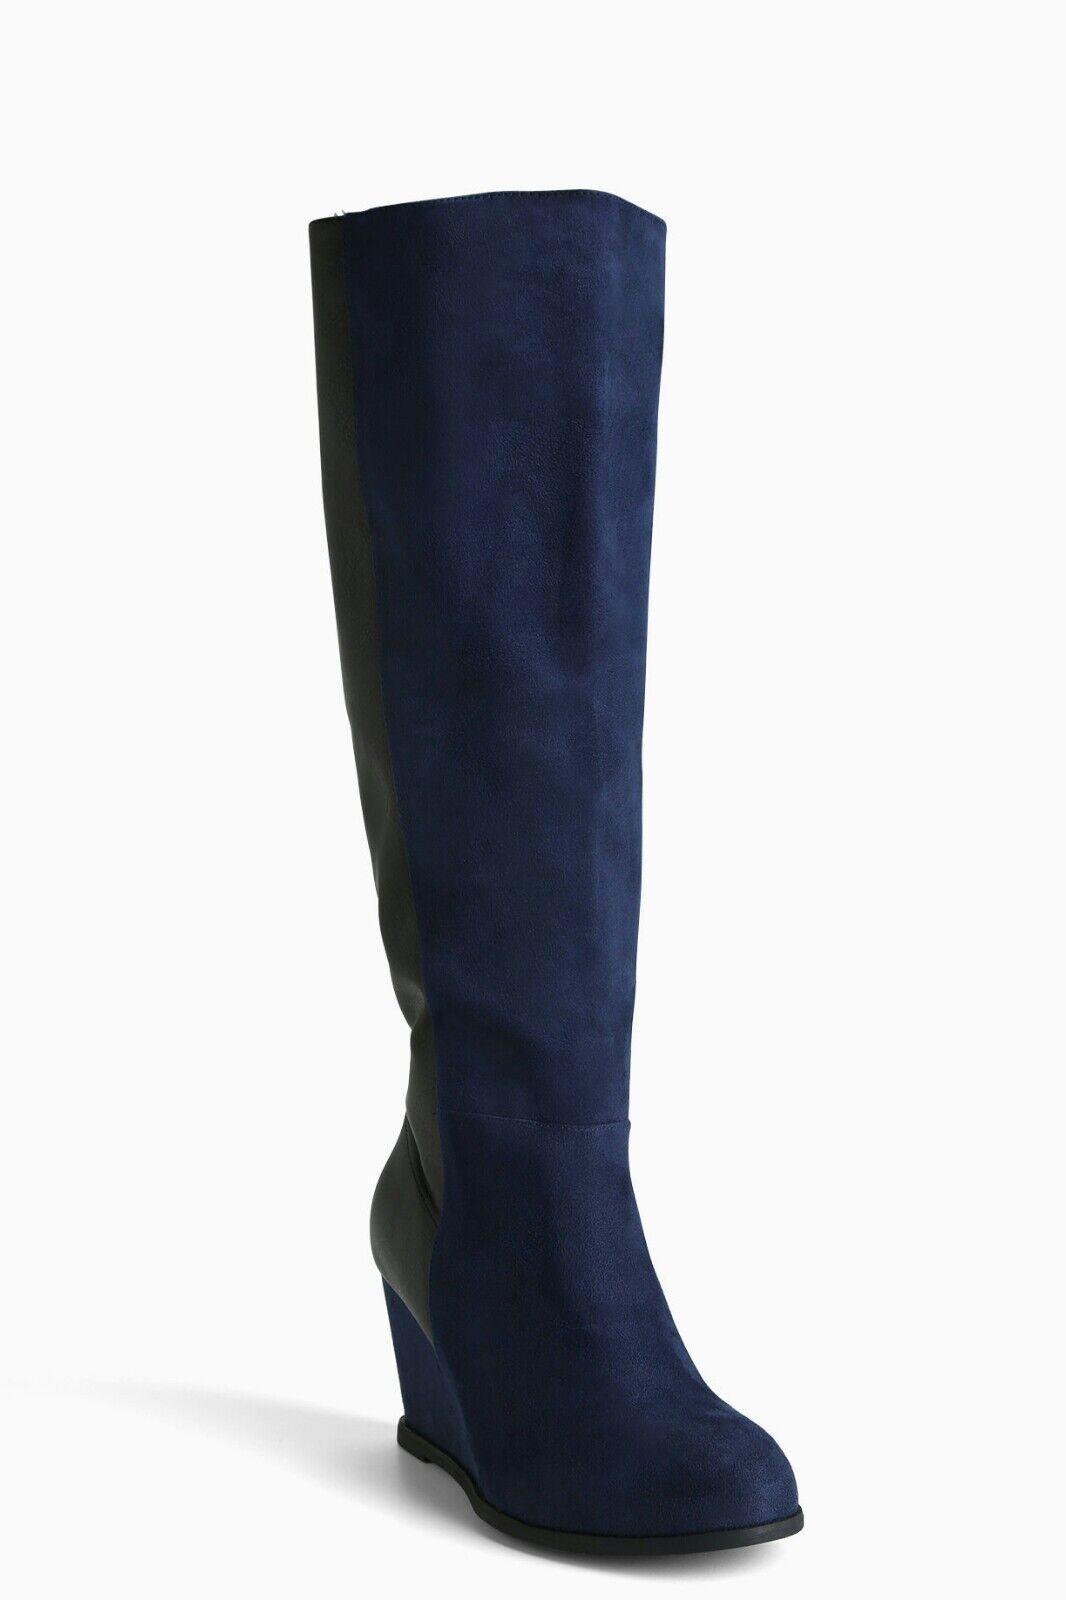 Torrid Faux Suede bluee Black Faux Leather Wedge Knee Knee Knee Boots 7.5 Wide Width Calf f1b9aa